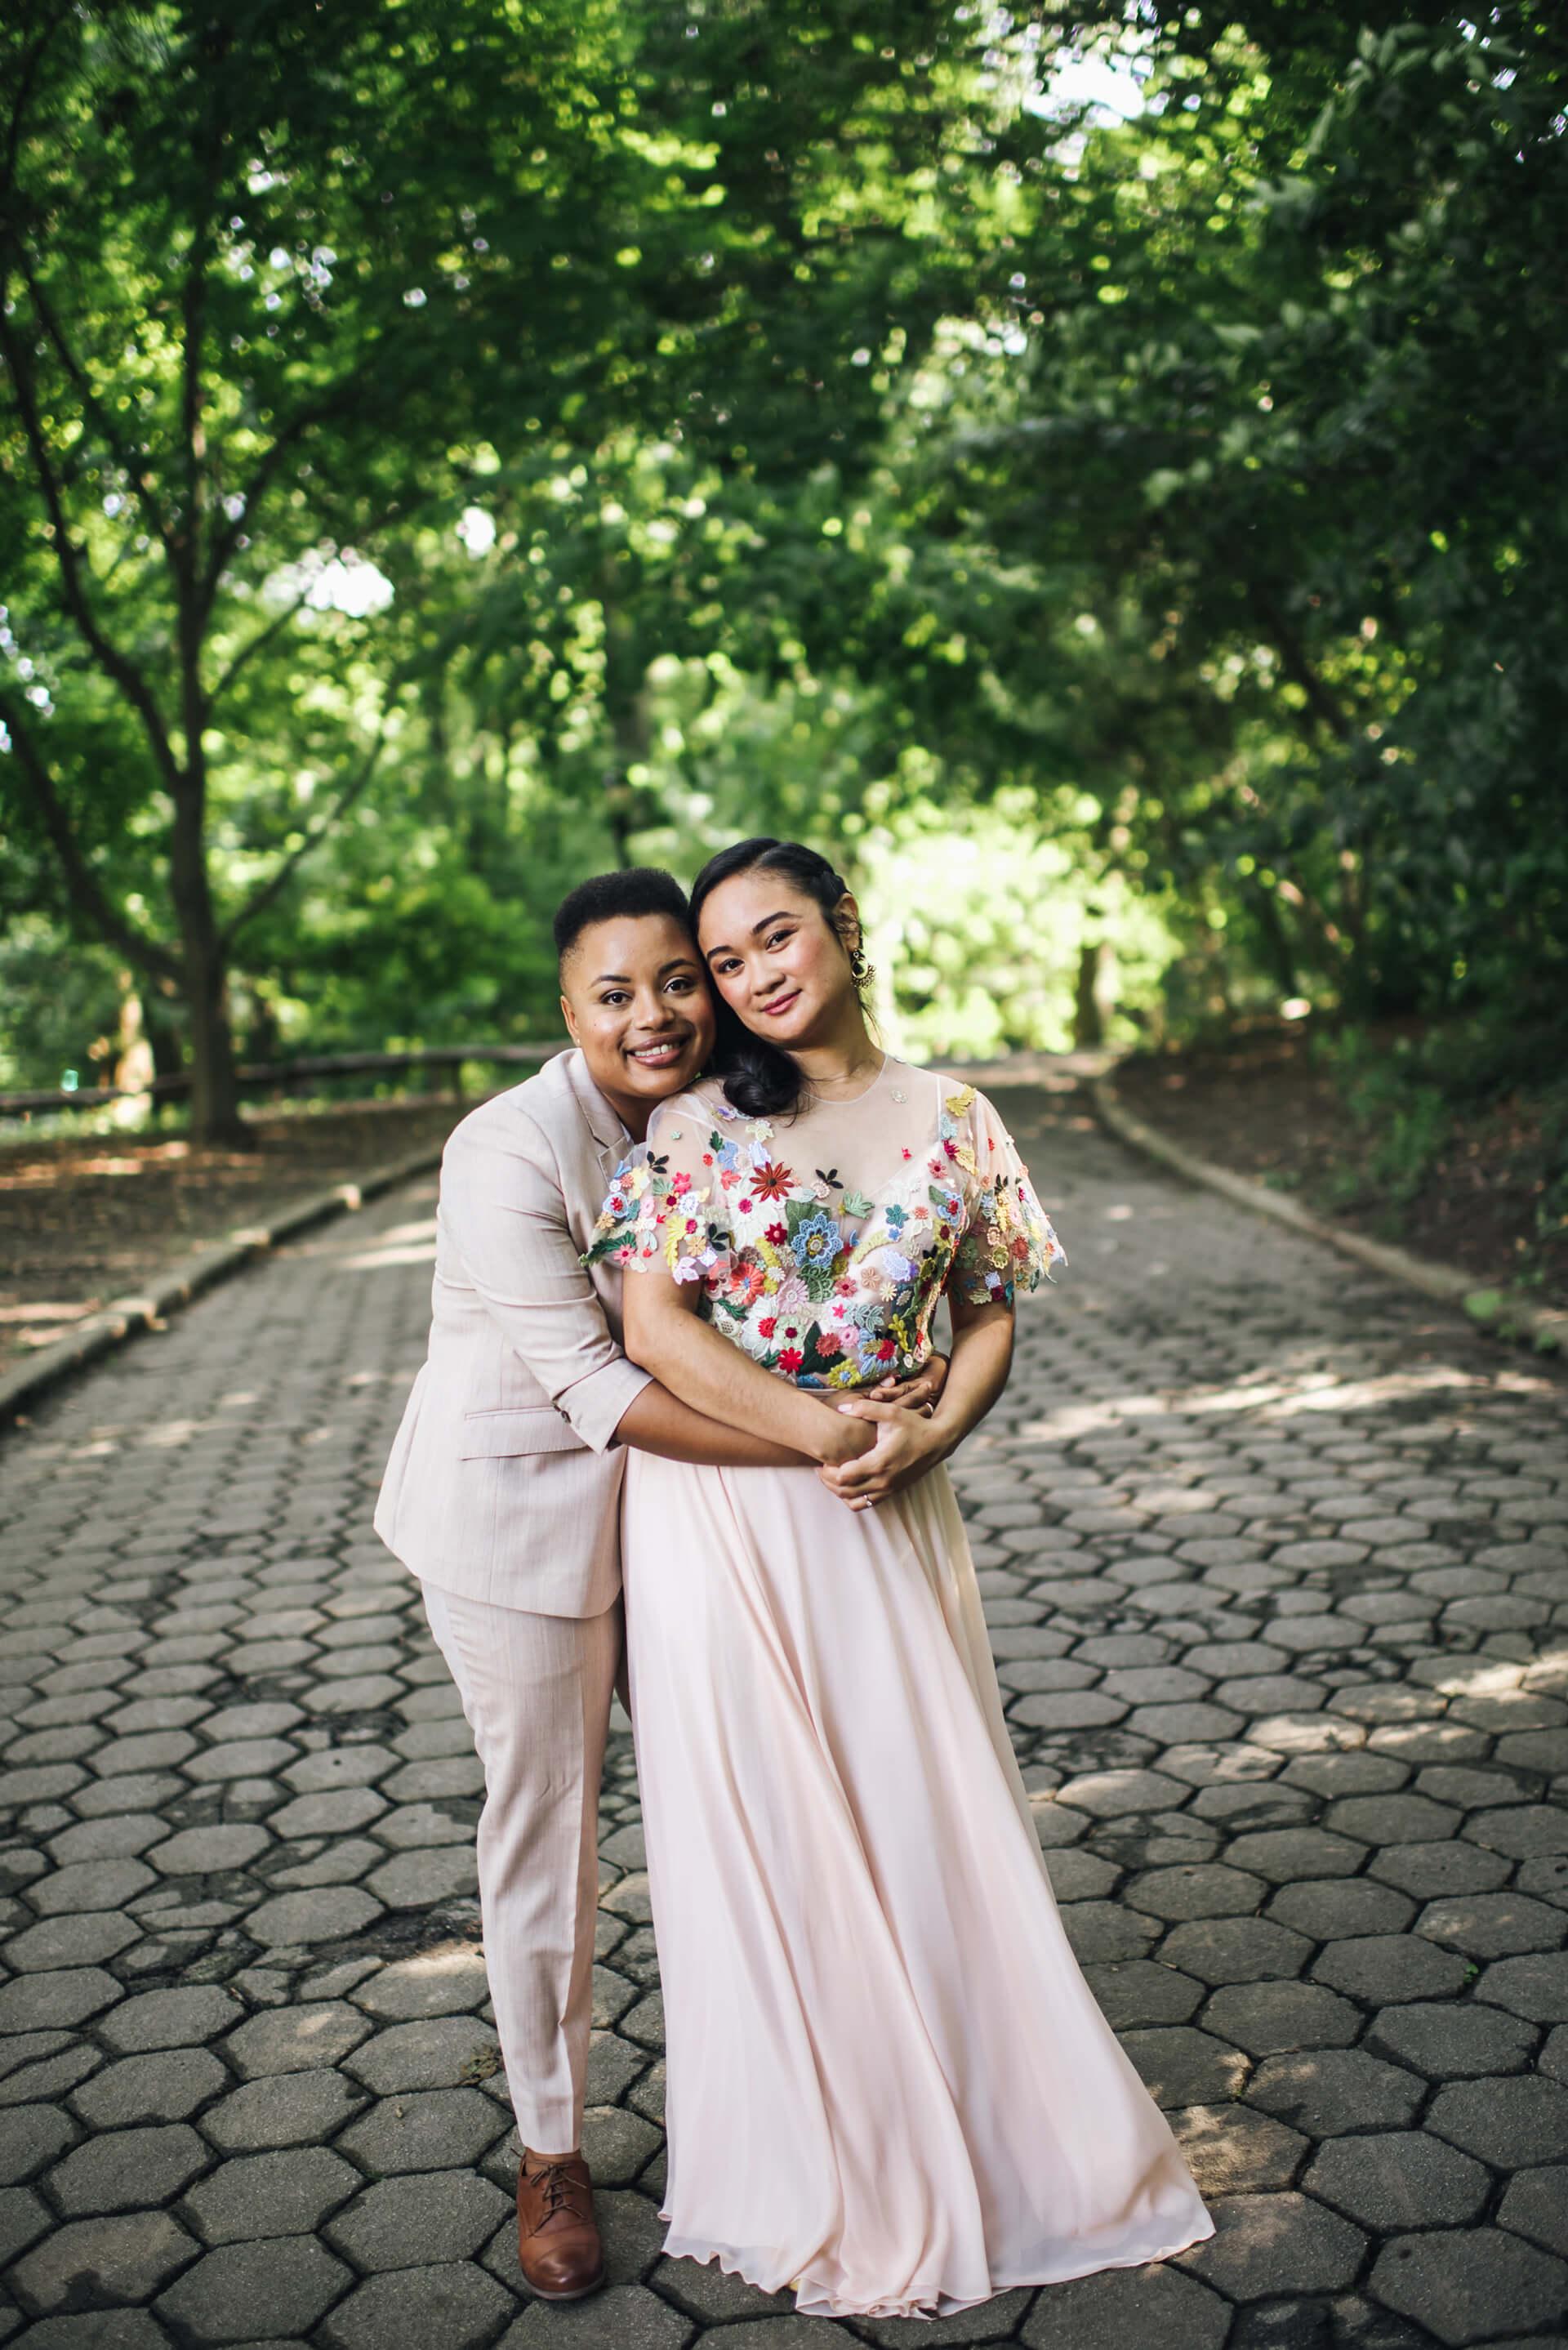 BROOKLYN SOCIETY FOR ETHICAL CULTURE - INTIMATE WEDDING - CHI-CHI ARI-94.jpg